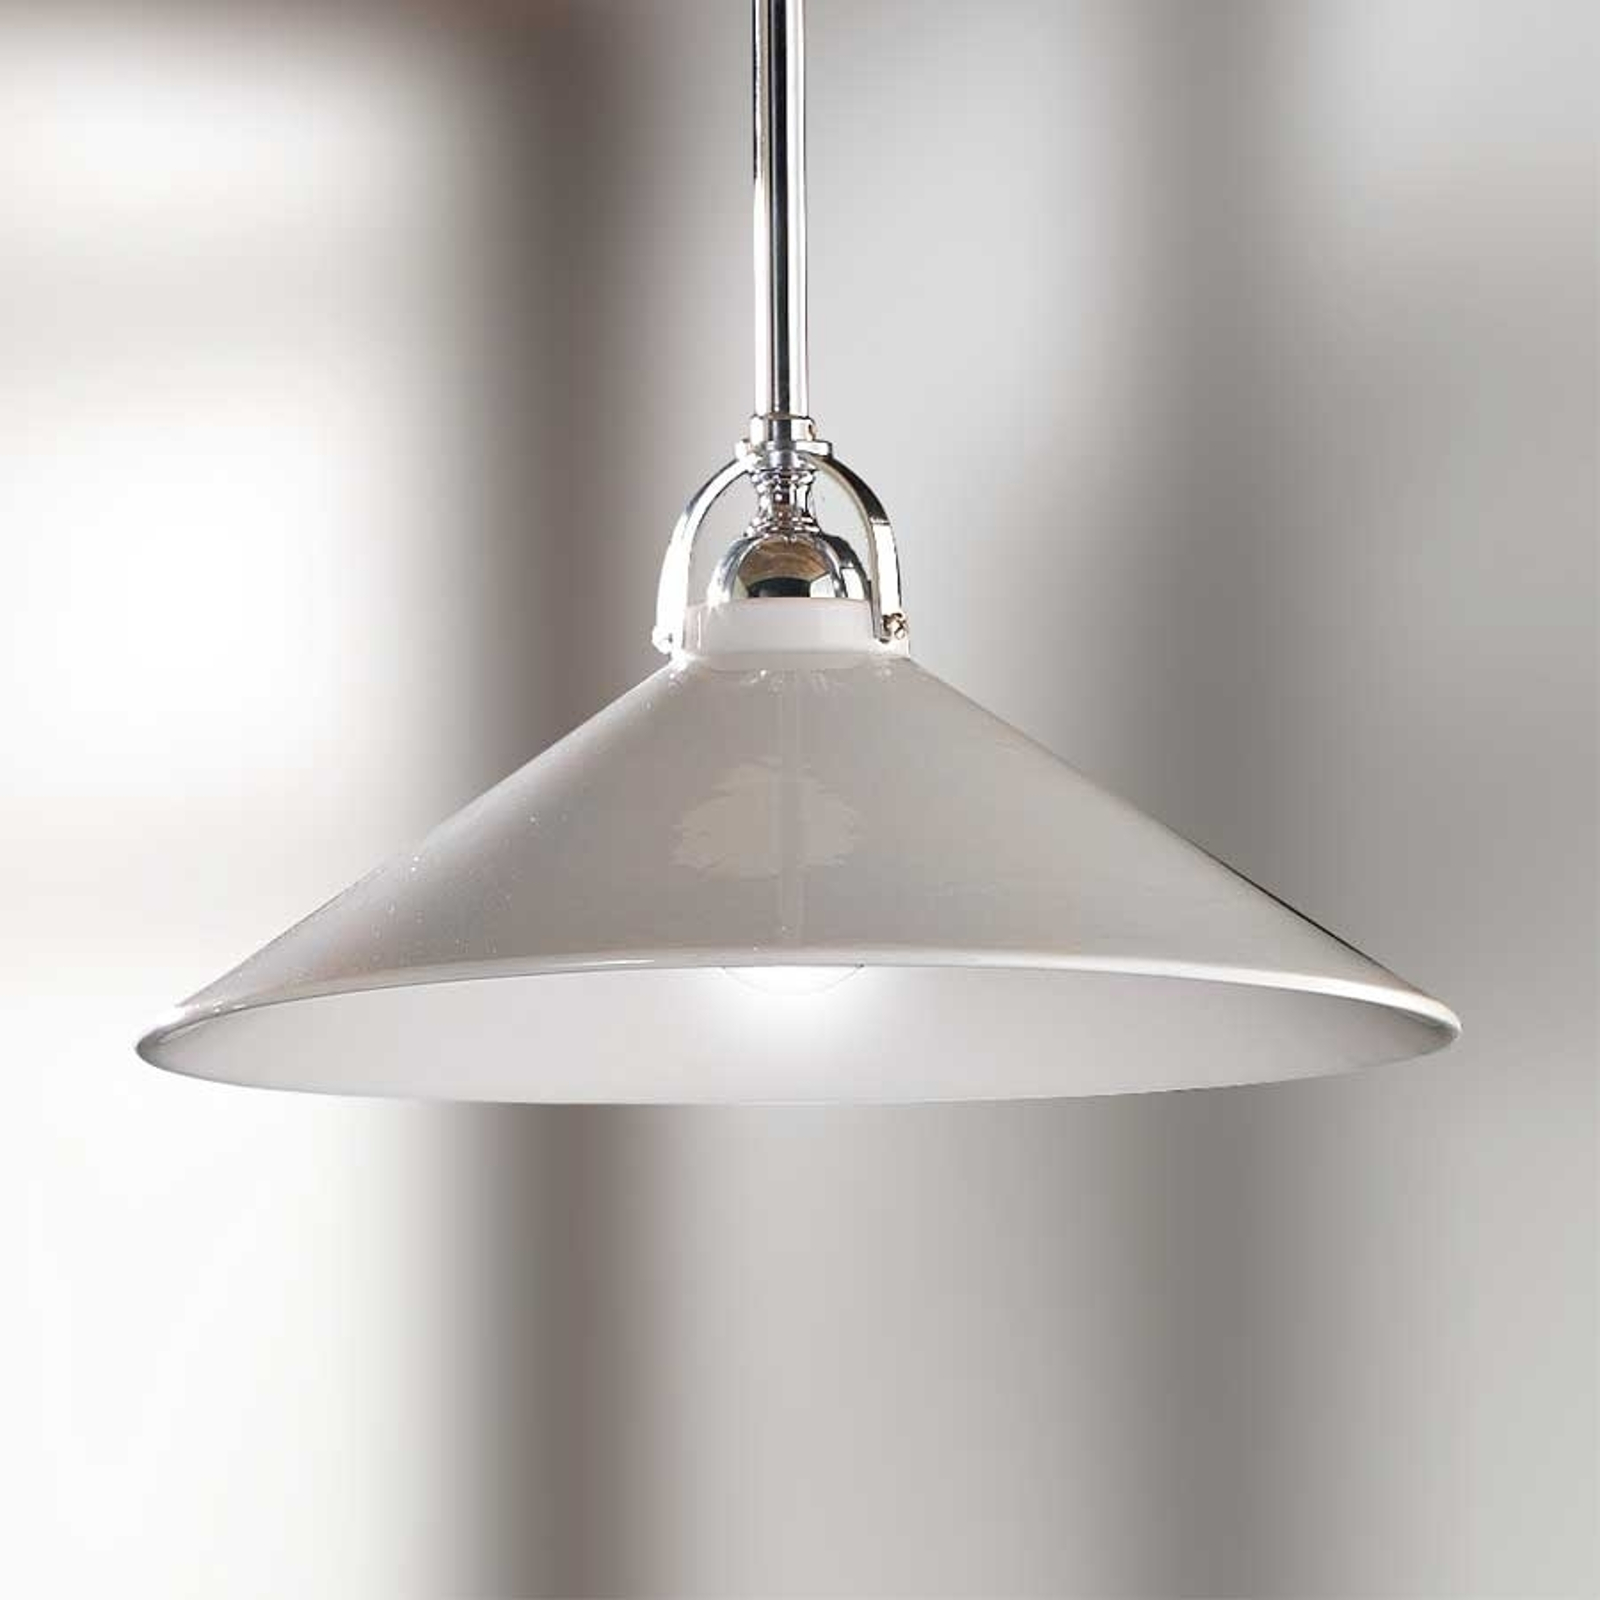 Lámpara colgante GIACOMO blanca, pantalla cerámica